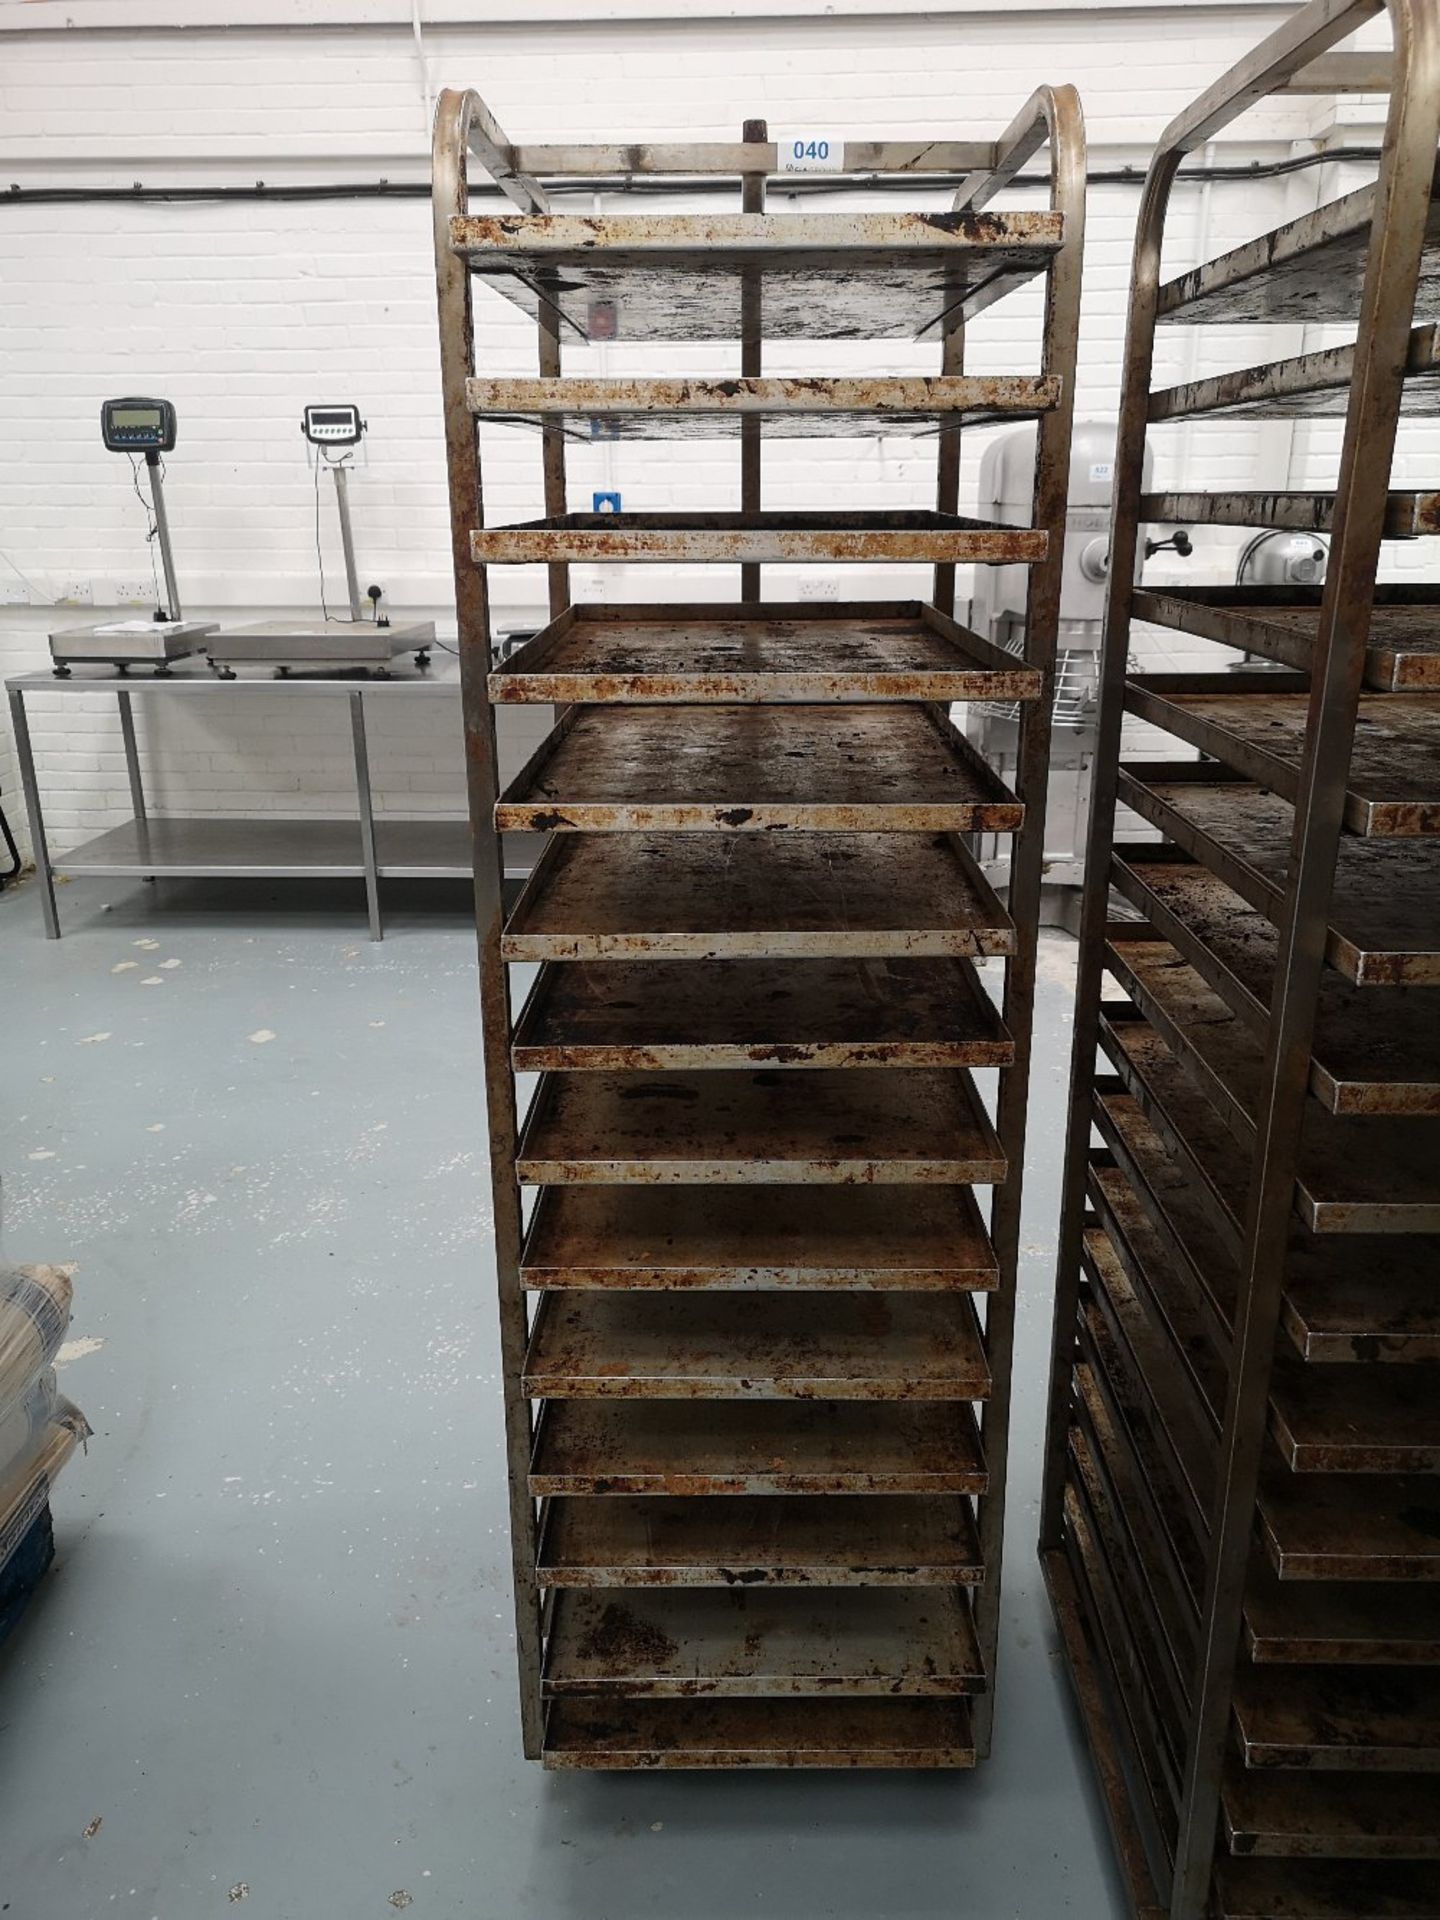 Fourteen Slot Bakery Rack/Tray Trolley